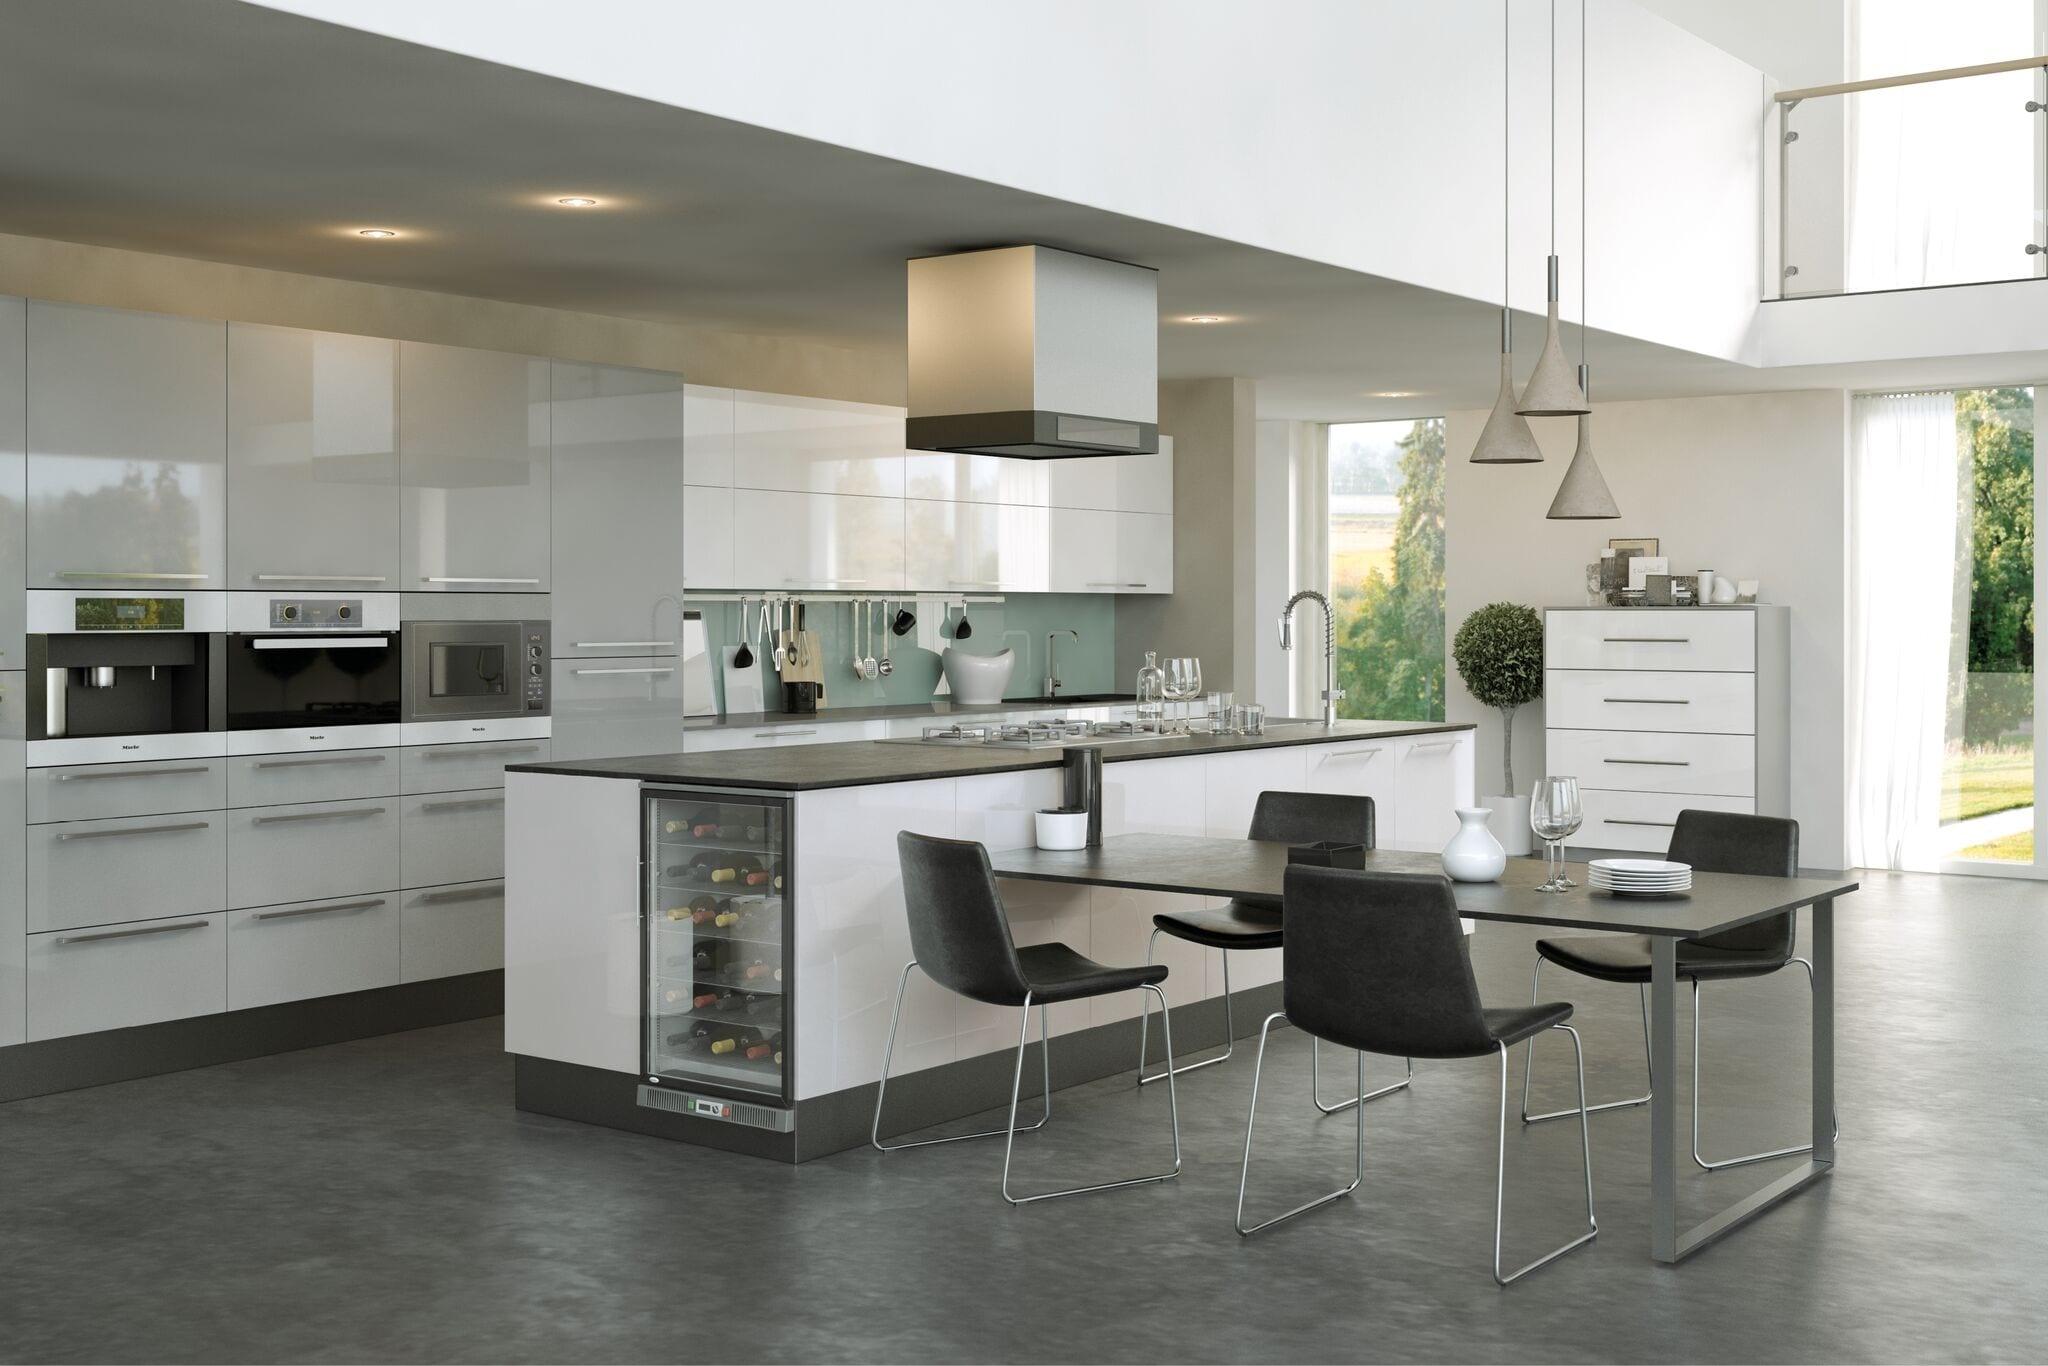 Firbeck flat panel kitchen in light grey